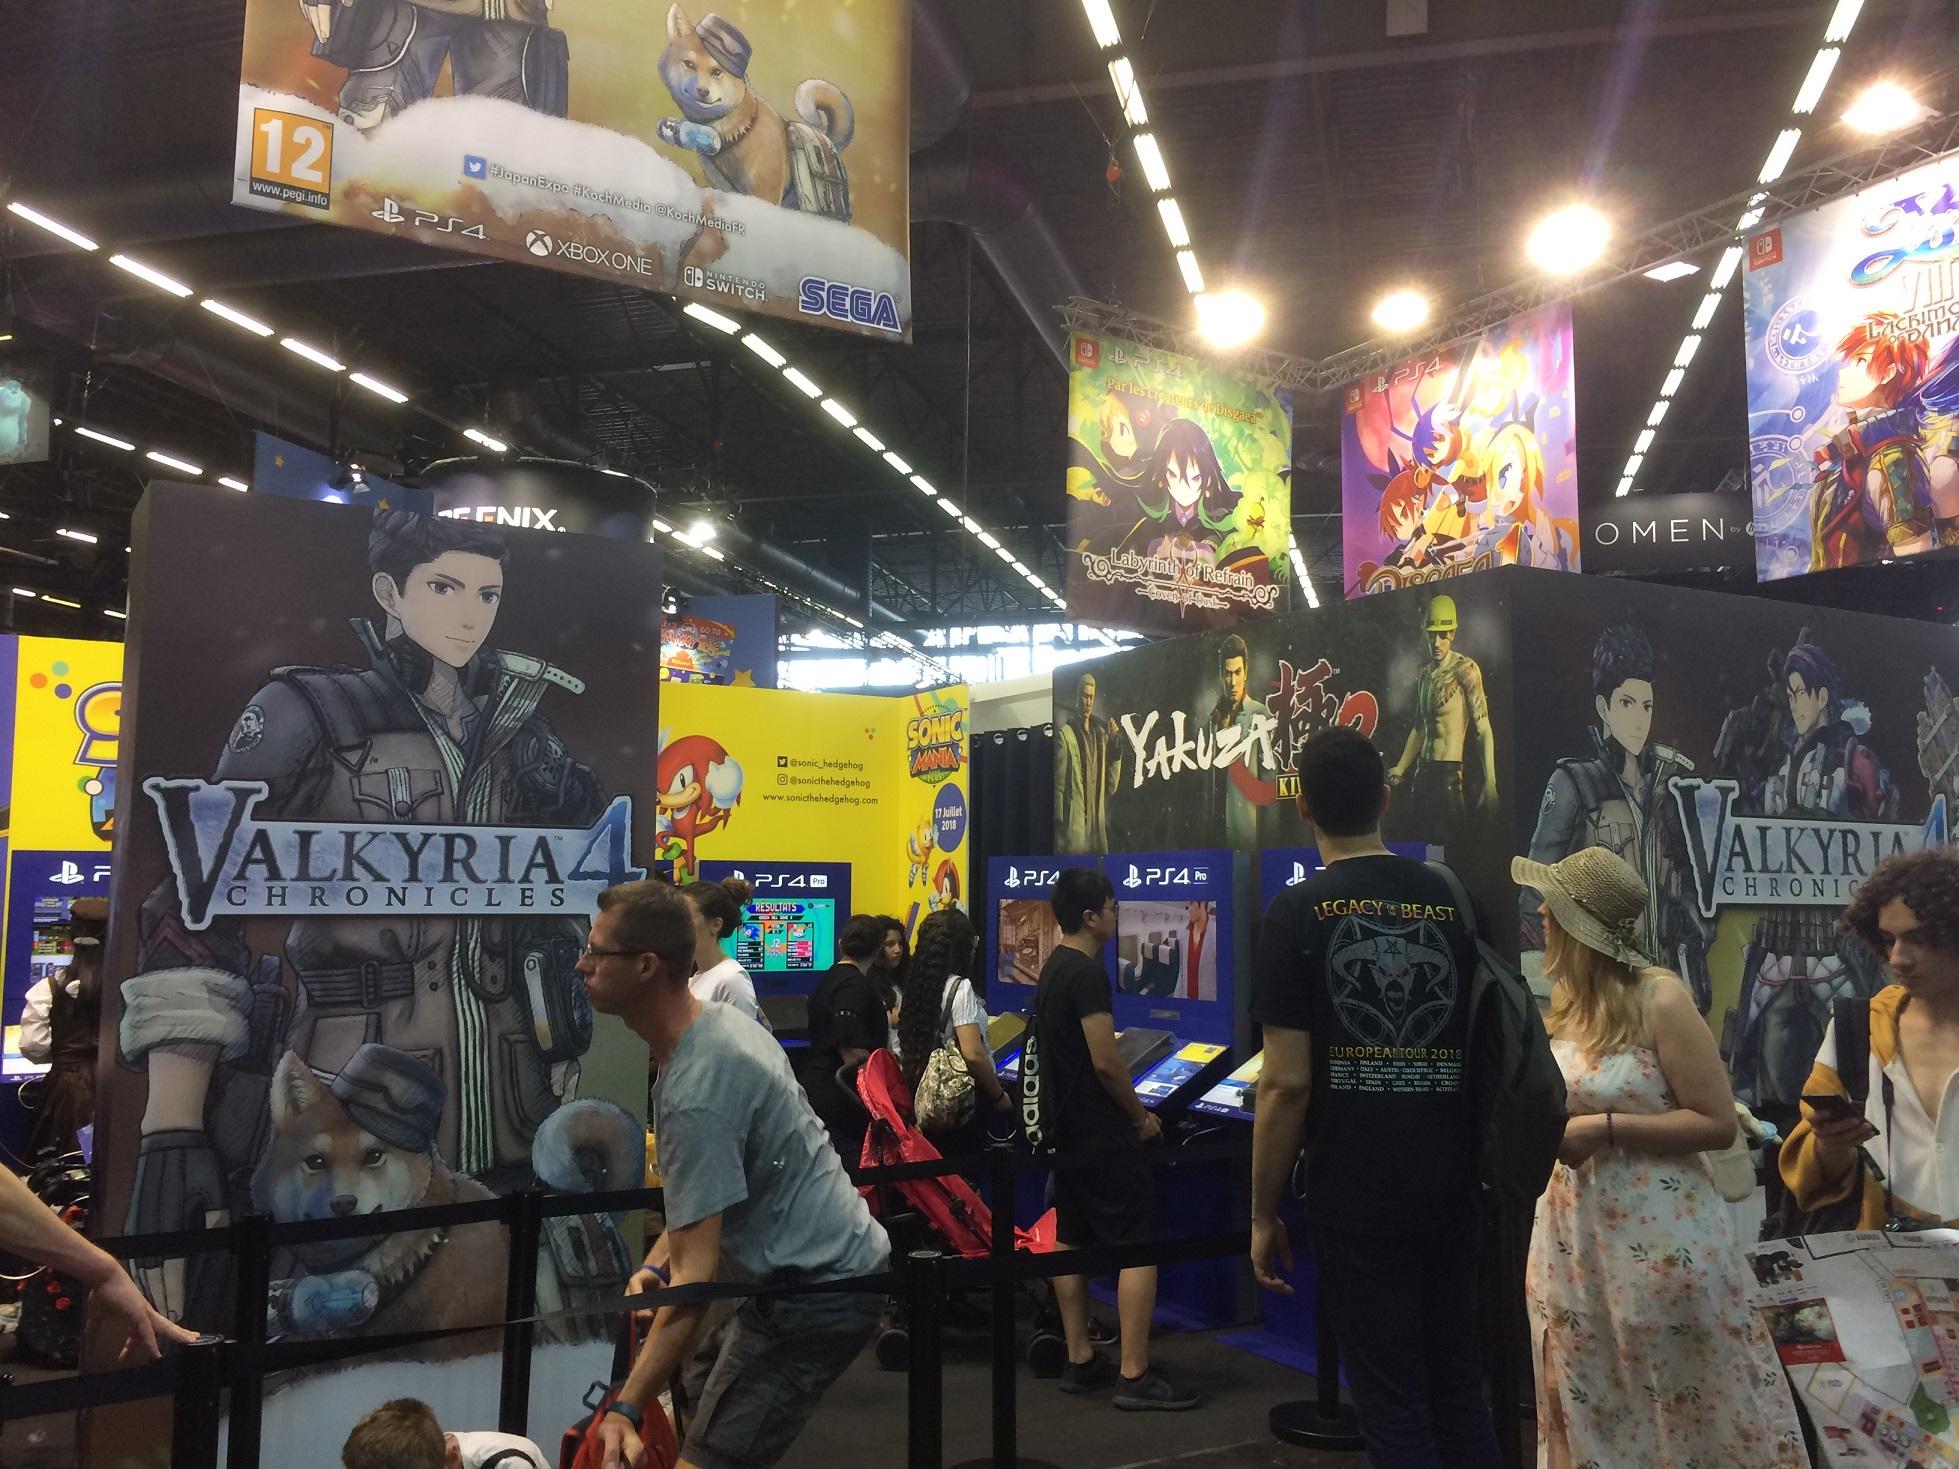 Japan Expo Les Stands : Japan expo 2018 : le stand koch media yakuza persona valkyria